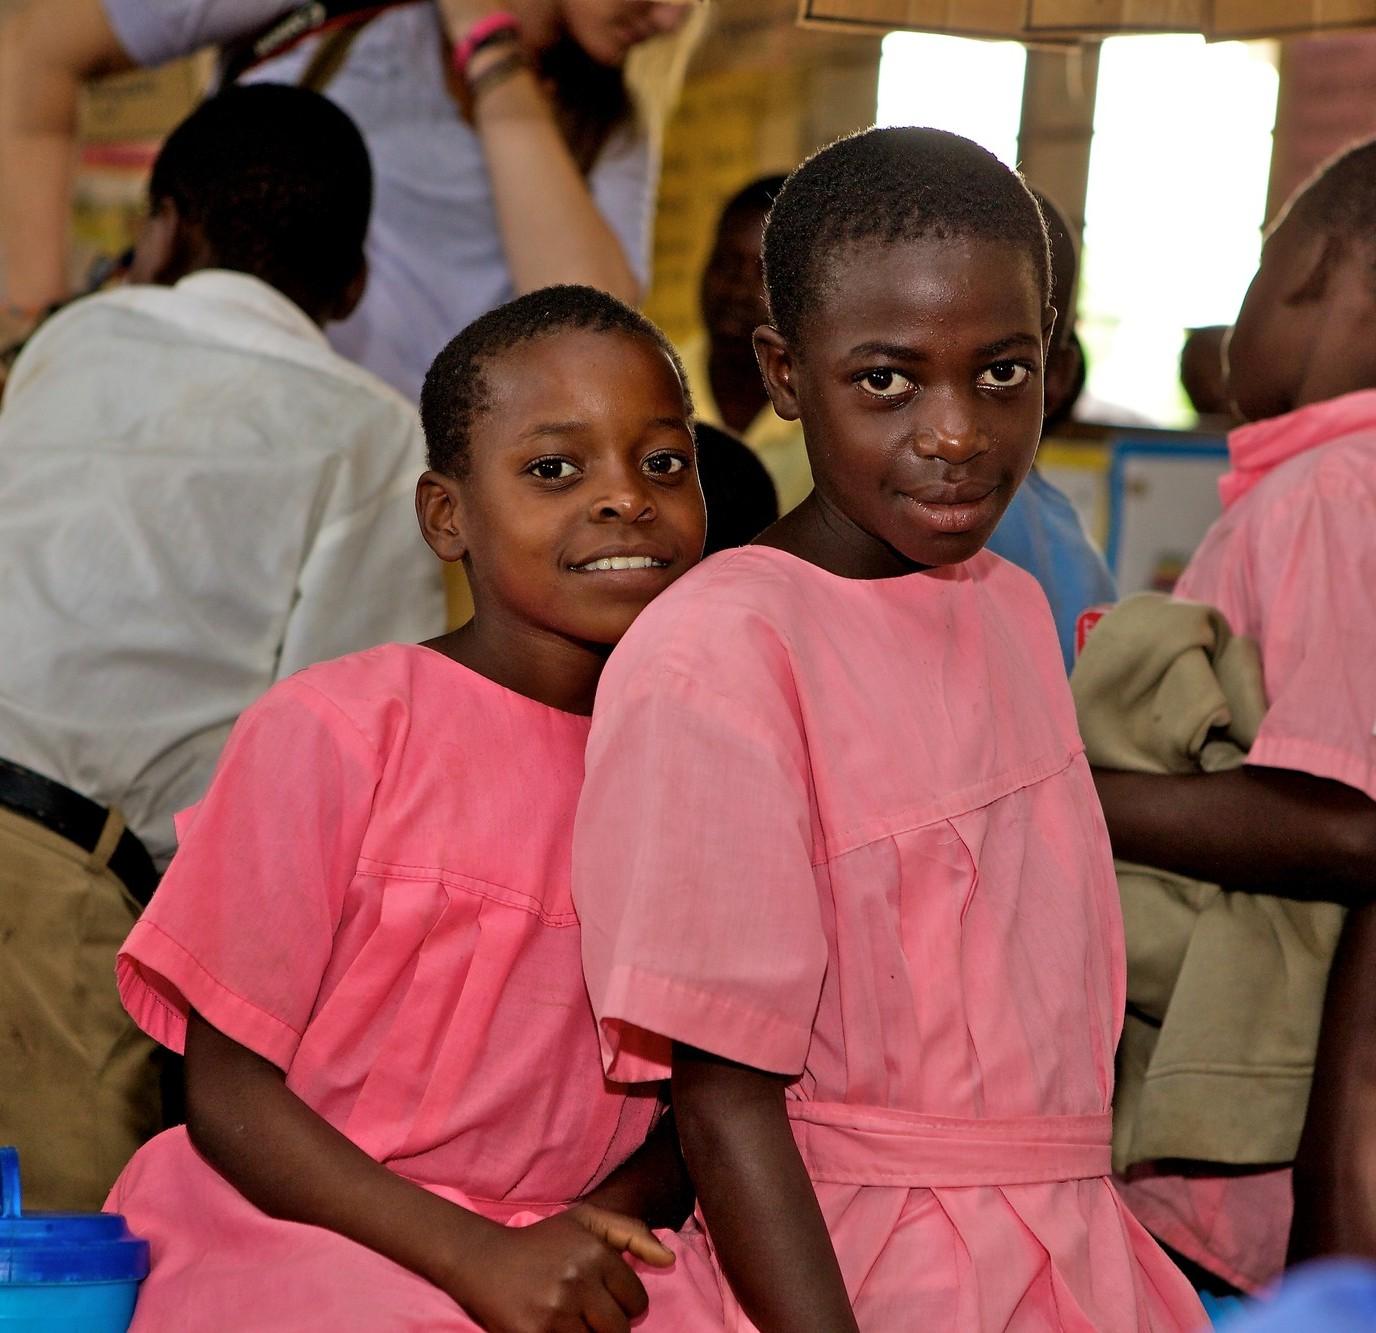 Girls in a classroom in Uganda